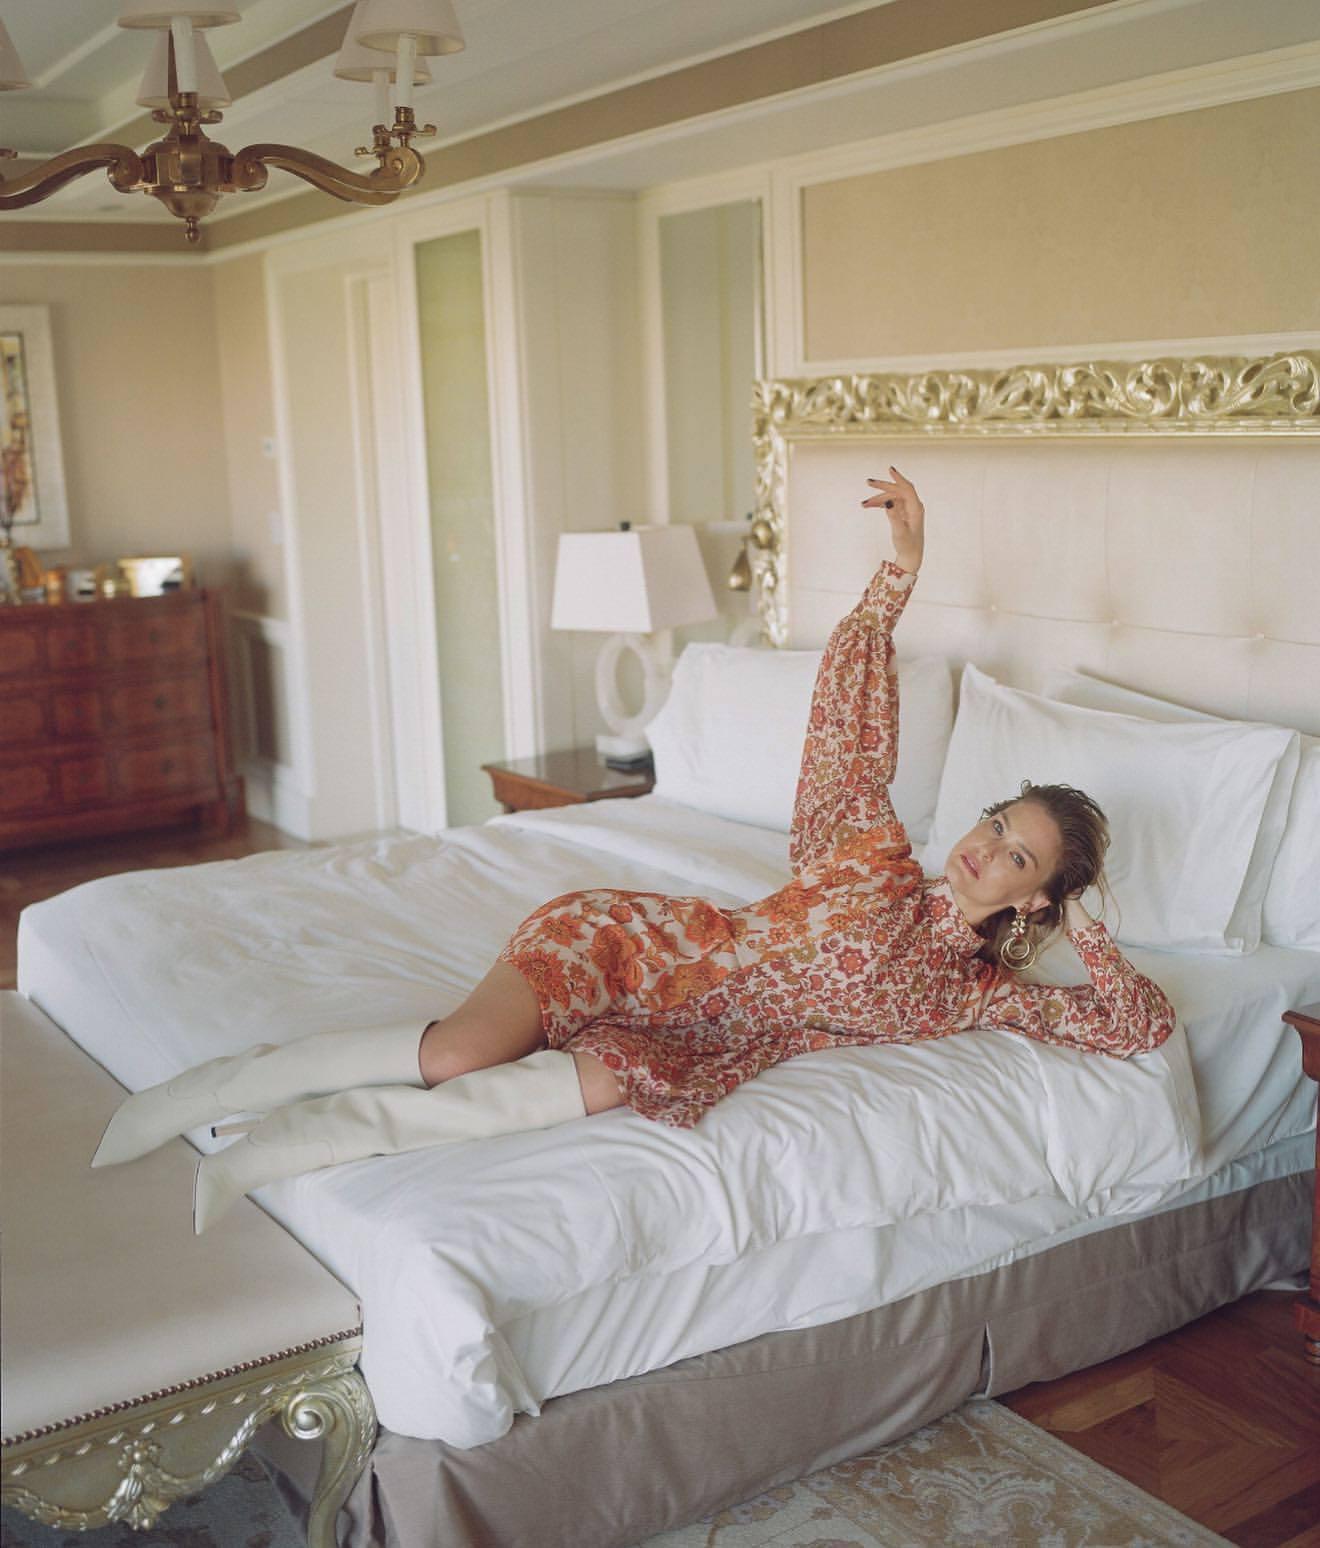 Bar Refaeli – Sexy Legs In Photoshoot For Dodo Bar Or Clothing Line 0013